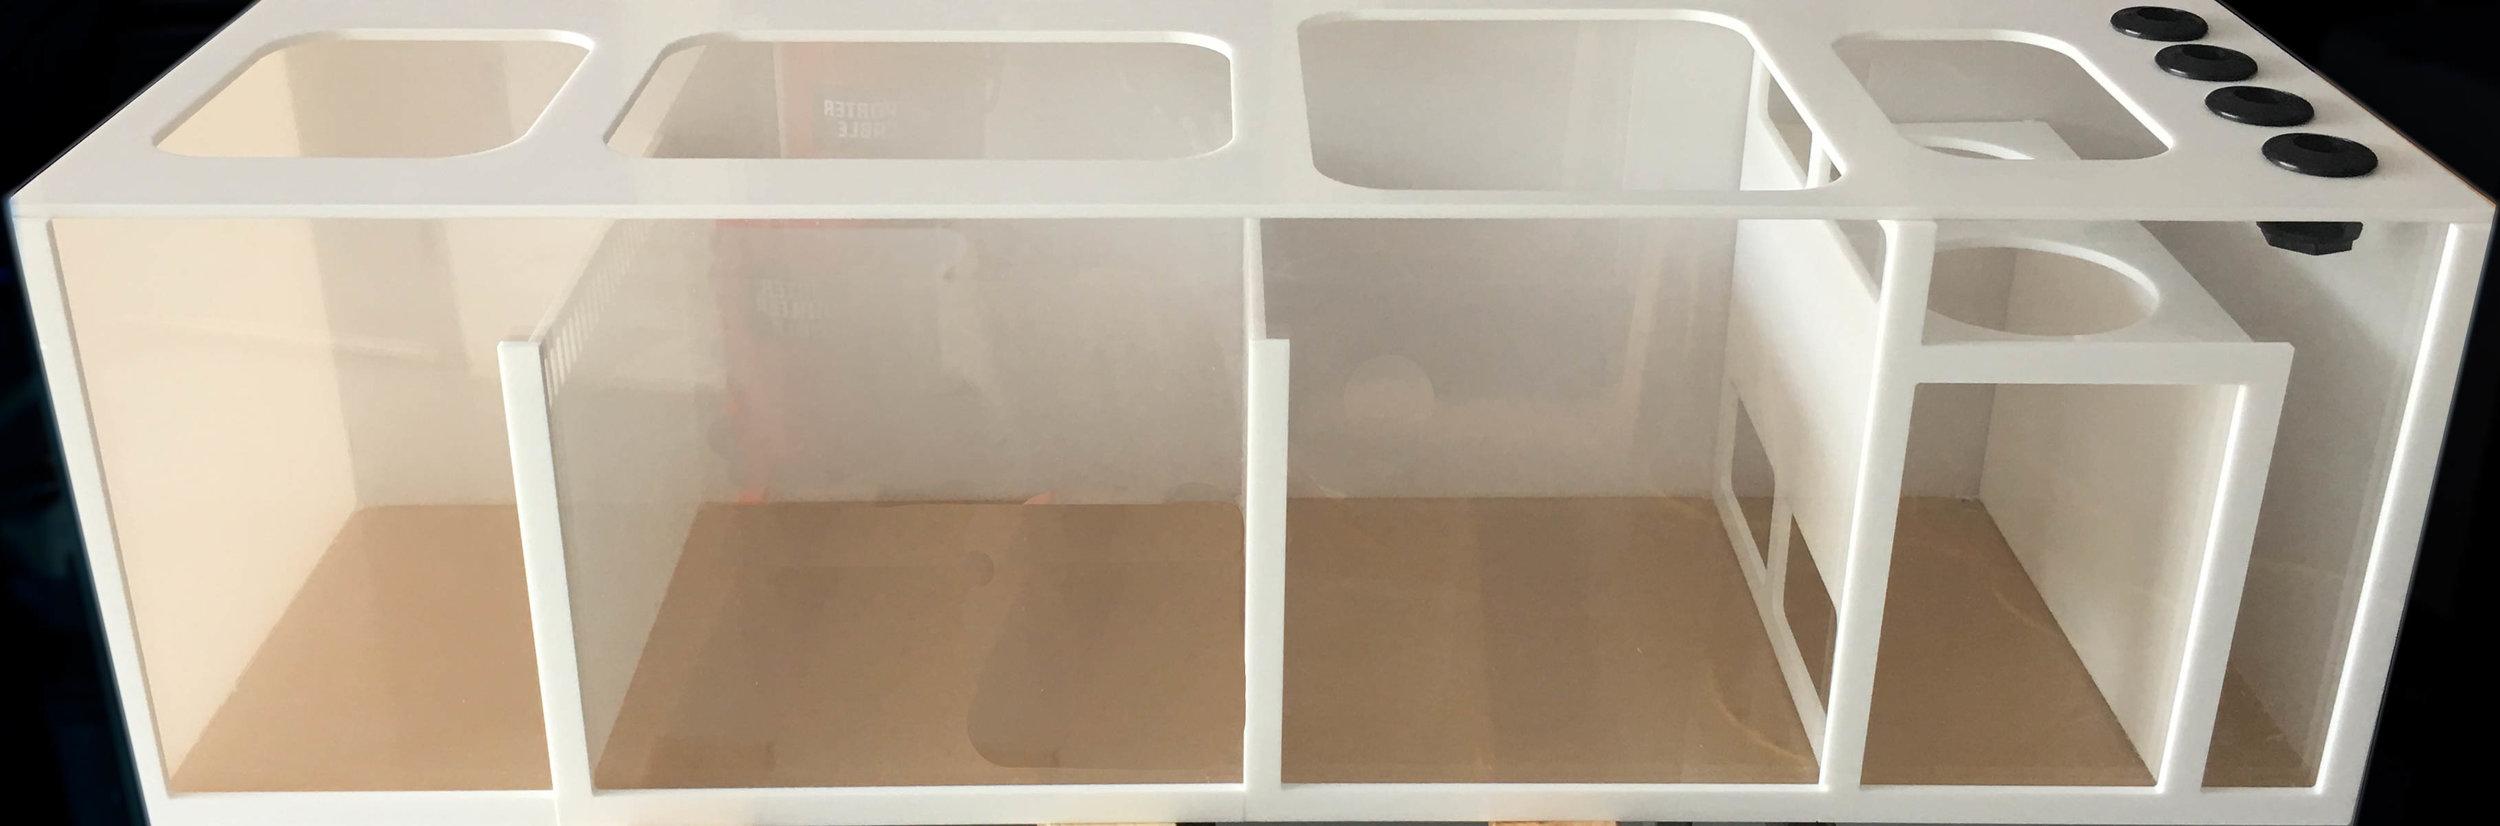 Large sump filter